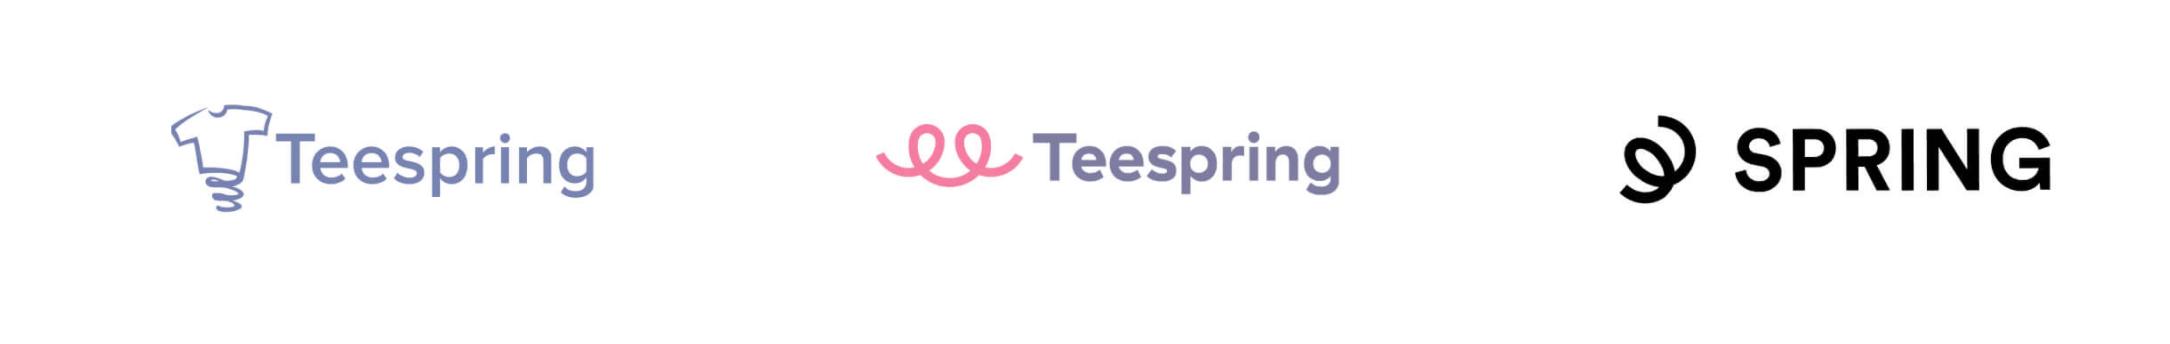 Teespring Evolution